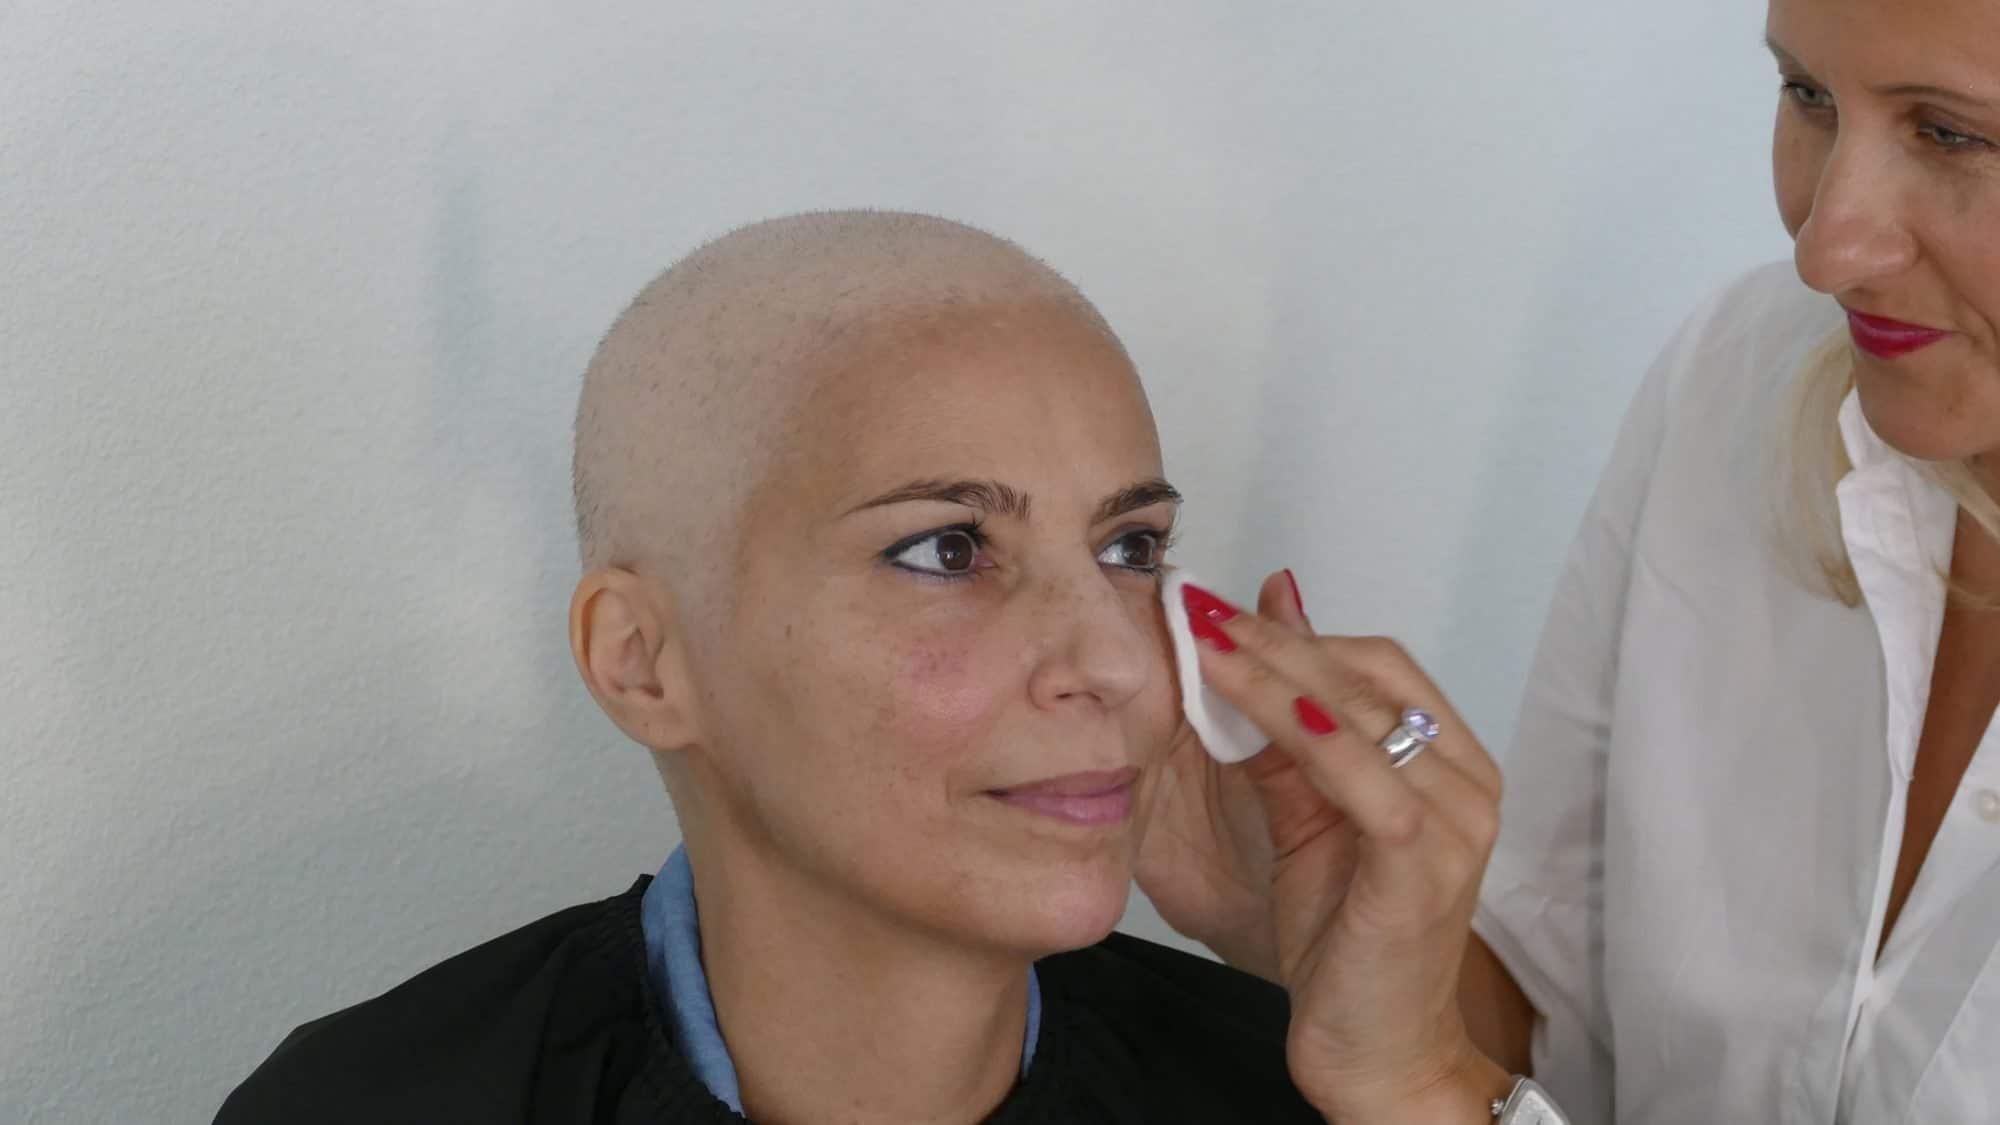 Schminken bei Chemotherapie: Tonic auftragen.